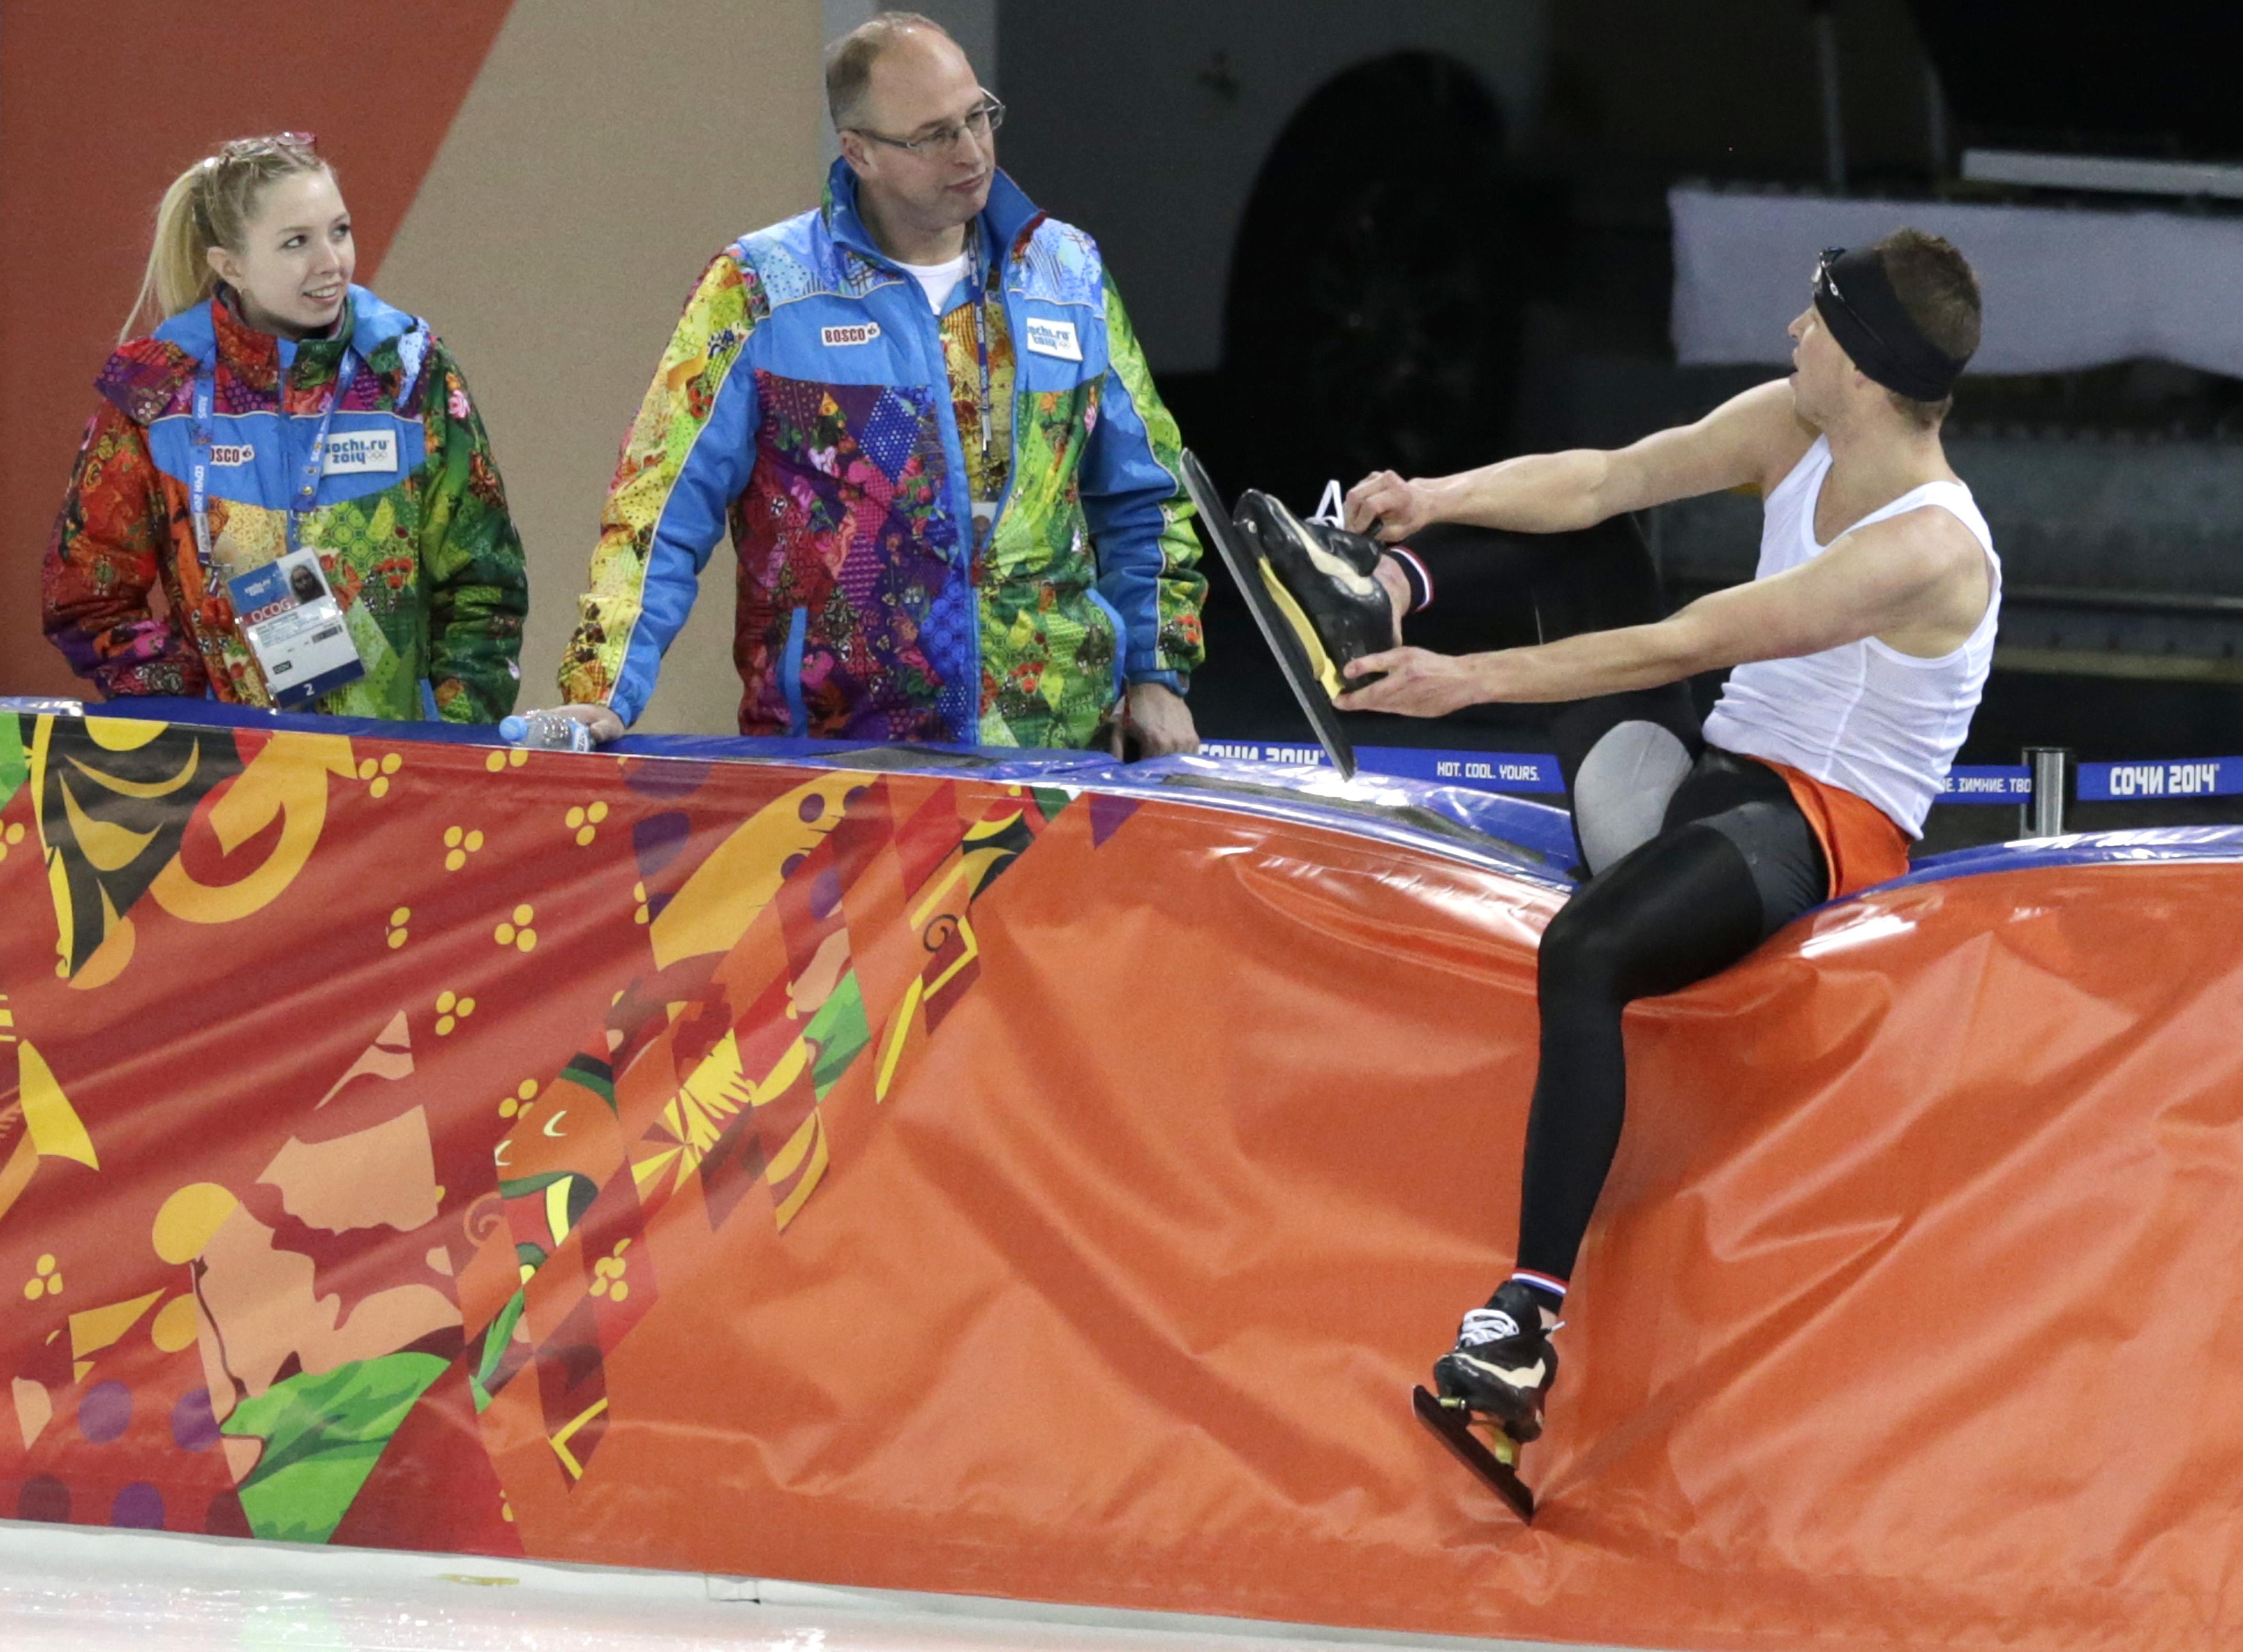 Sven Kramer of the Netherlands talks to volunteers at the Adler Arena Skating Center at the 2014 Winter Olympics, Friday, Feb. 14, 2014, in Sochi, Russia. (AP Photo/Matt Dunham)